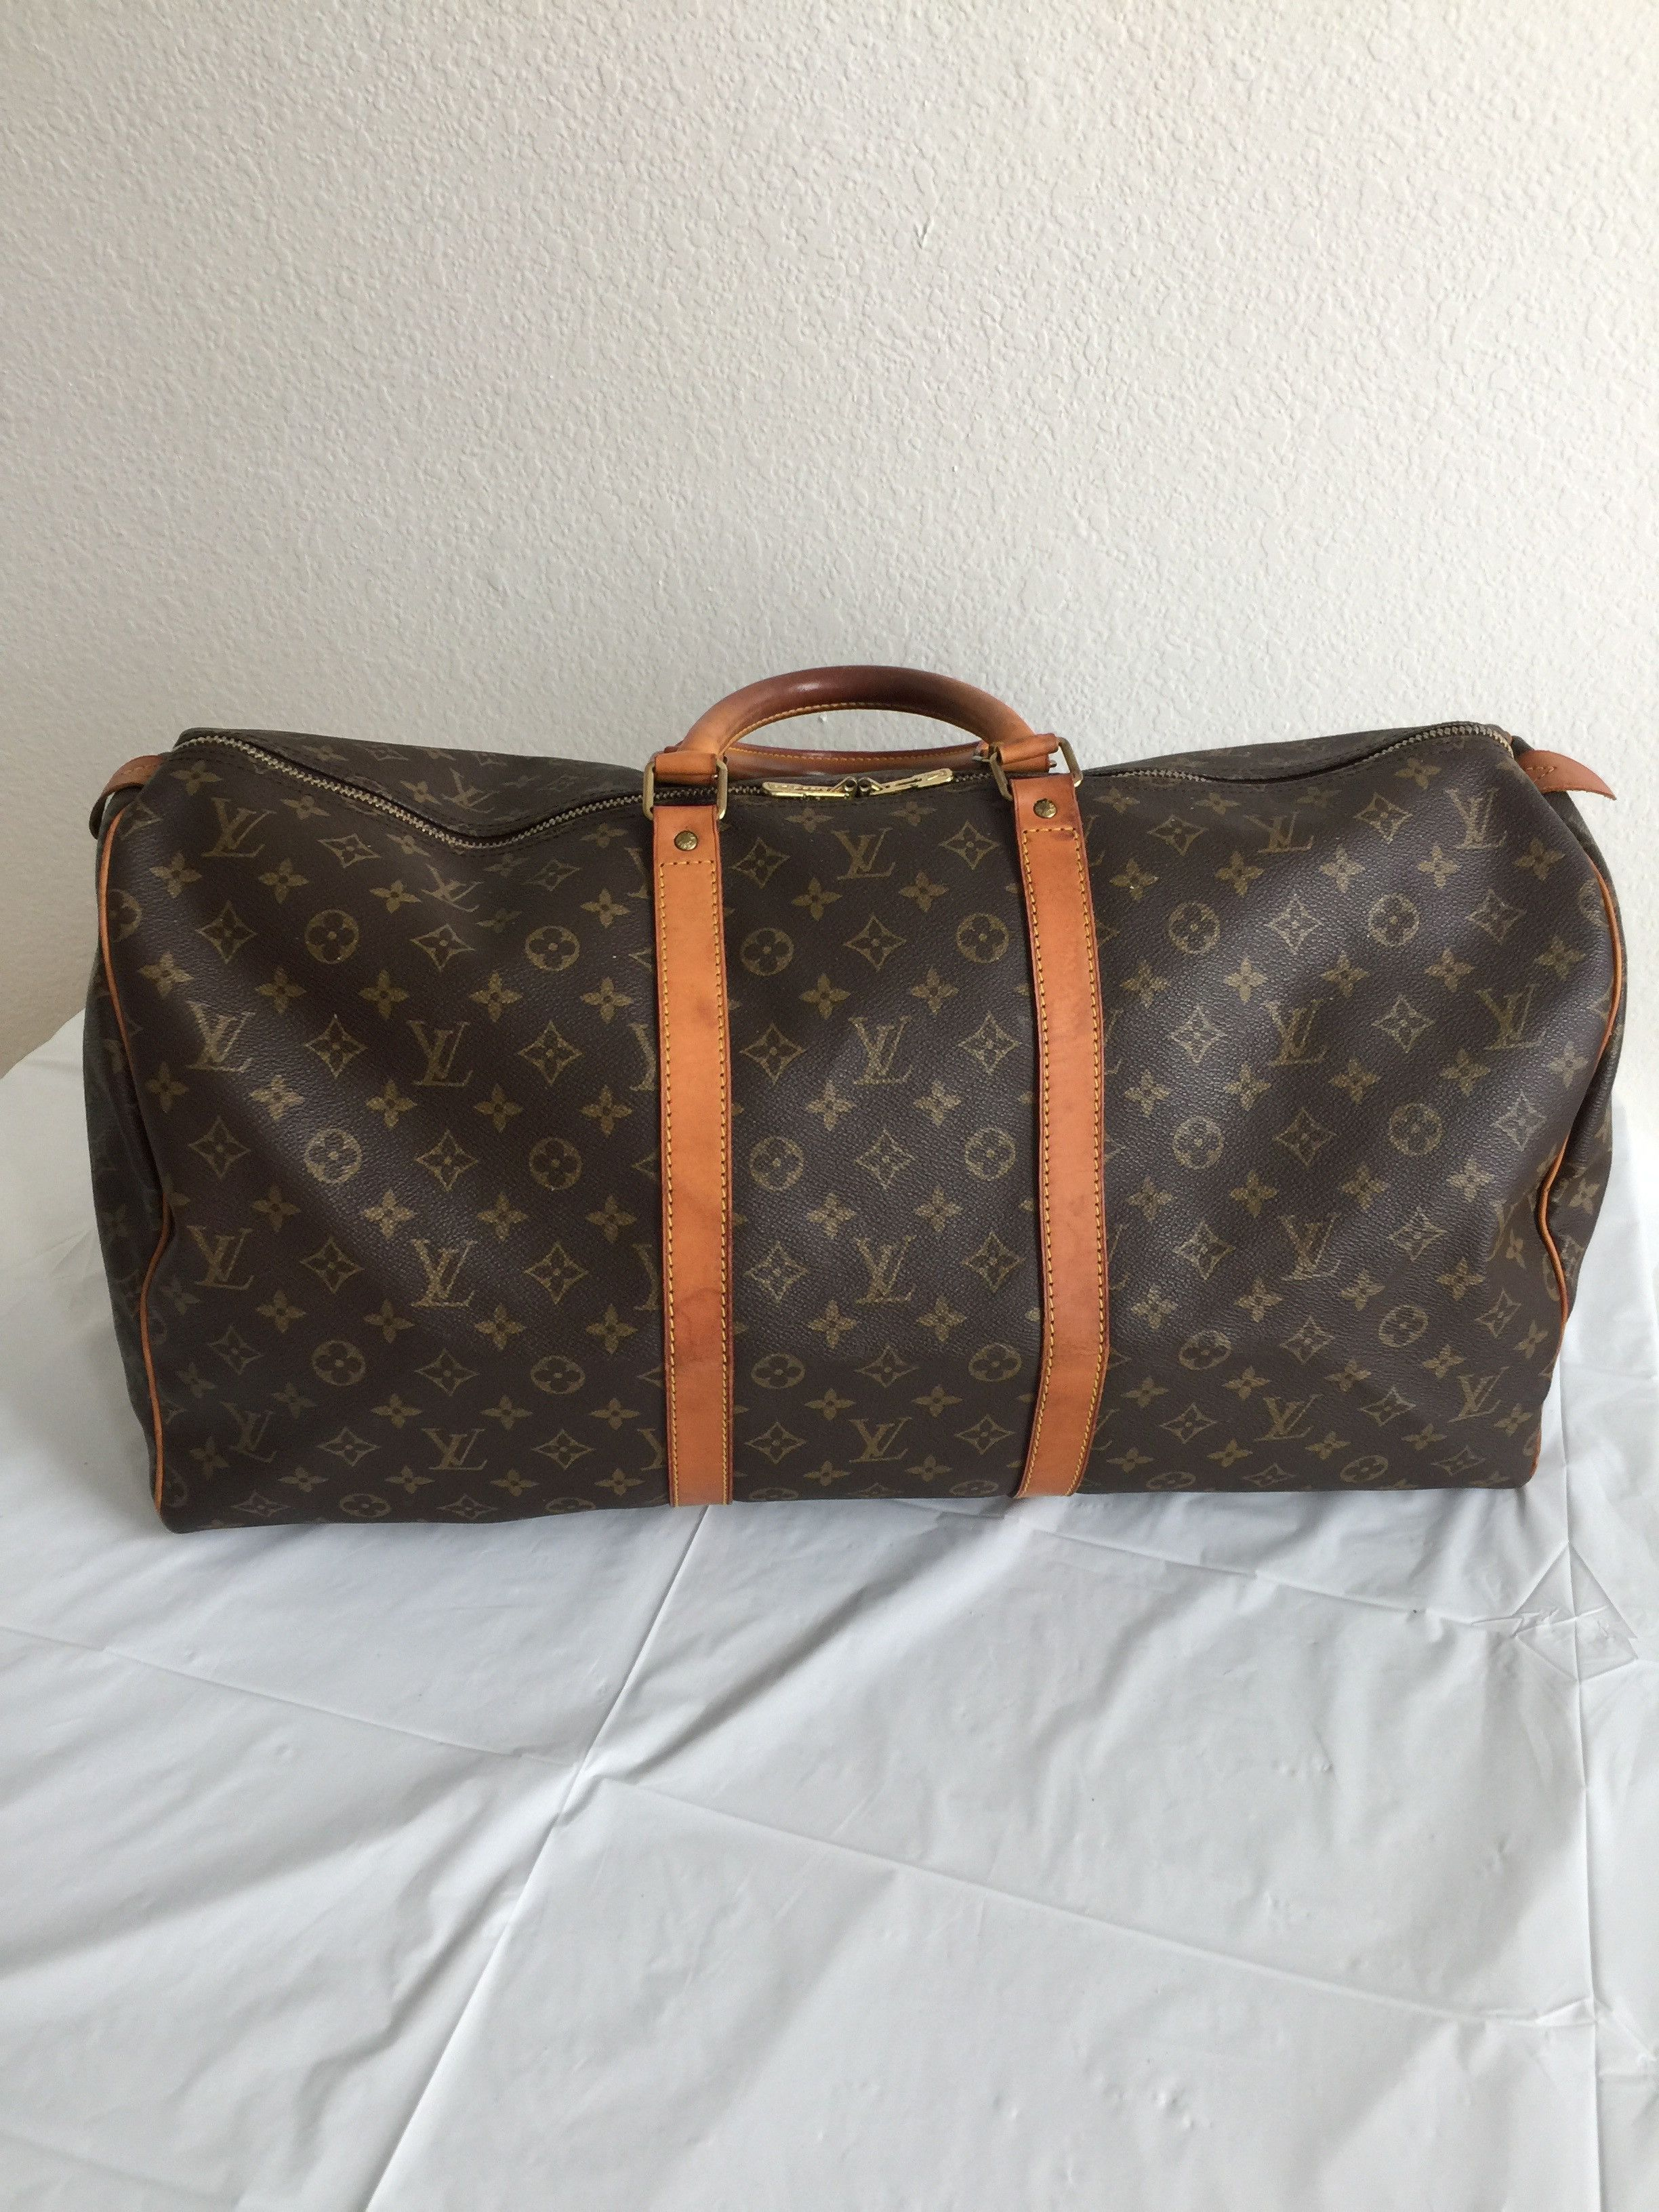 Preloved Authentic Louis Vuitton Boston Bag Keepall 55